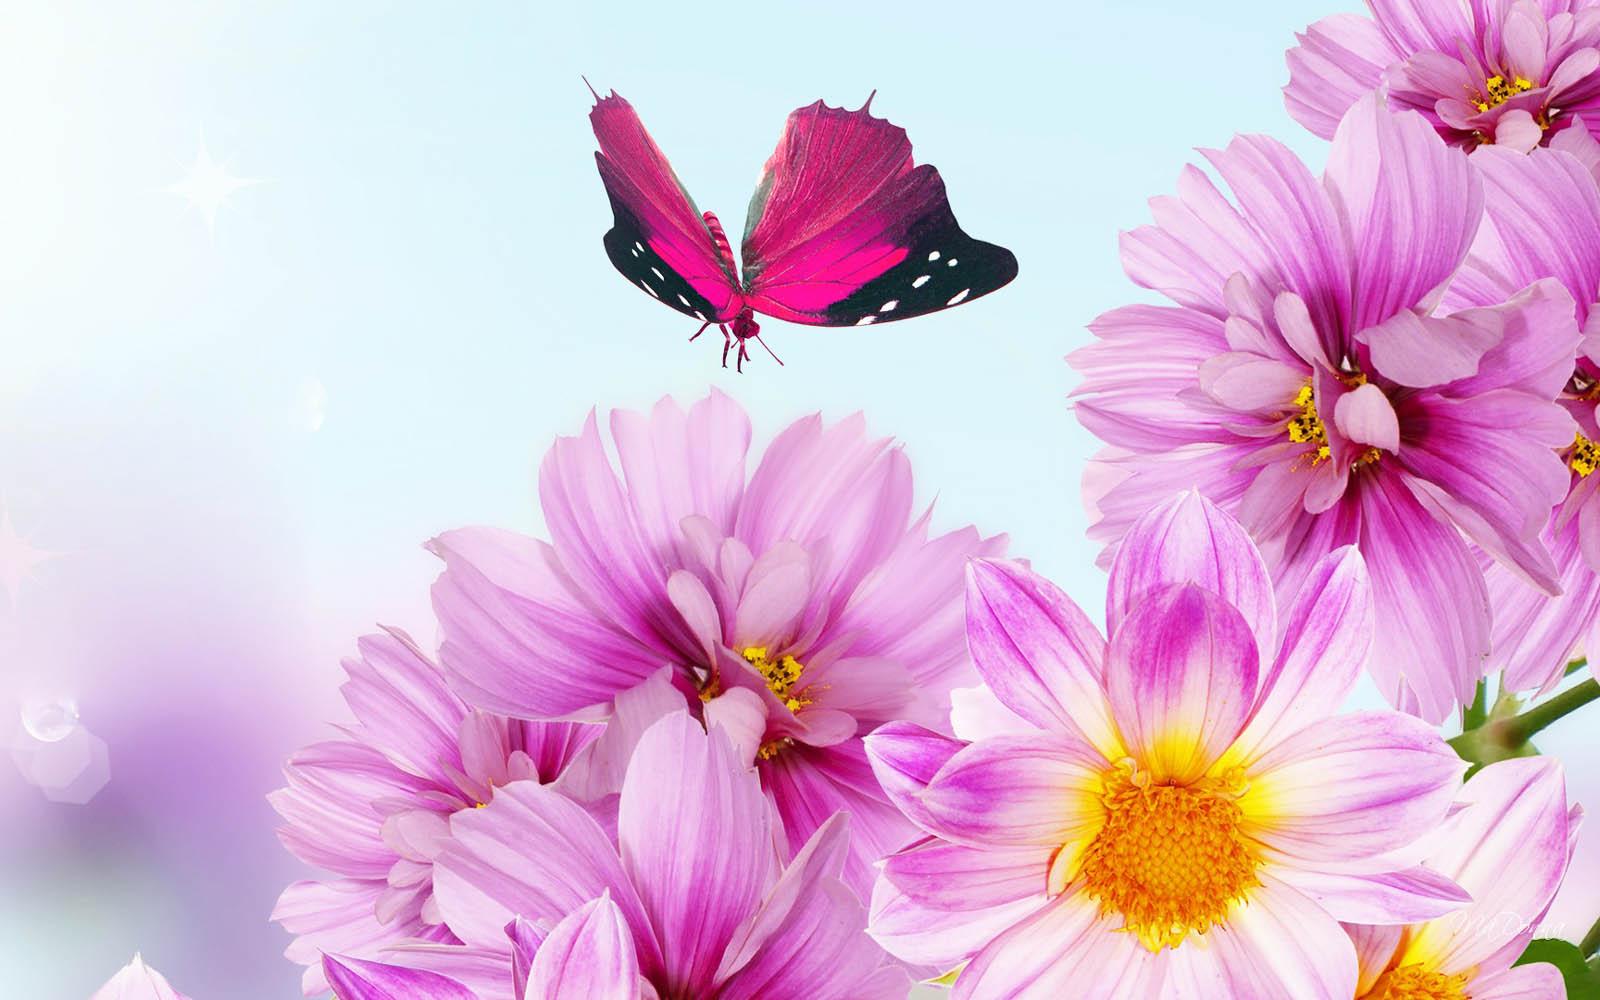 Flower Background Wallpaper Desktop Wallpapers 1600x1000